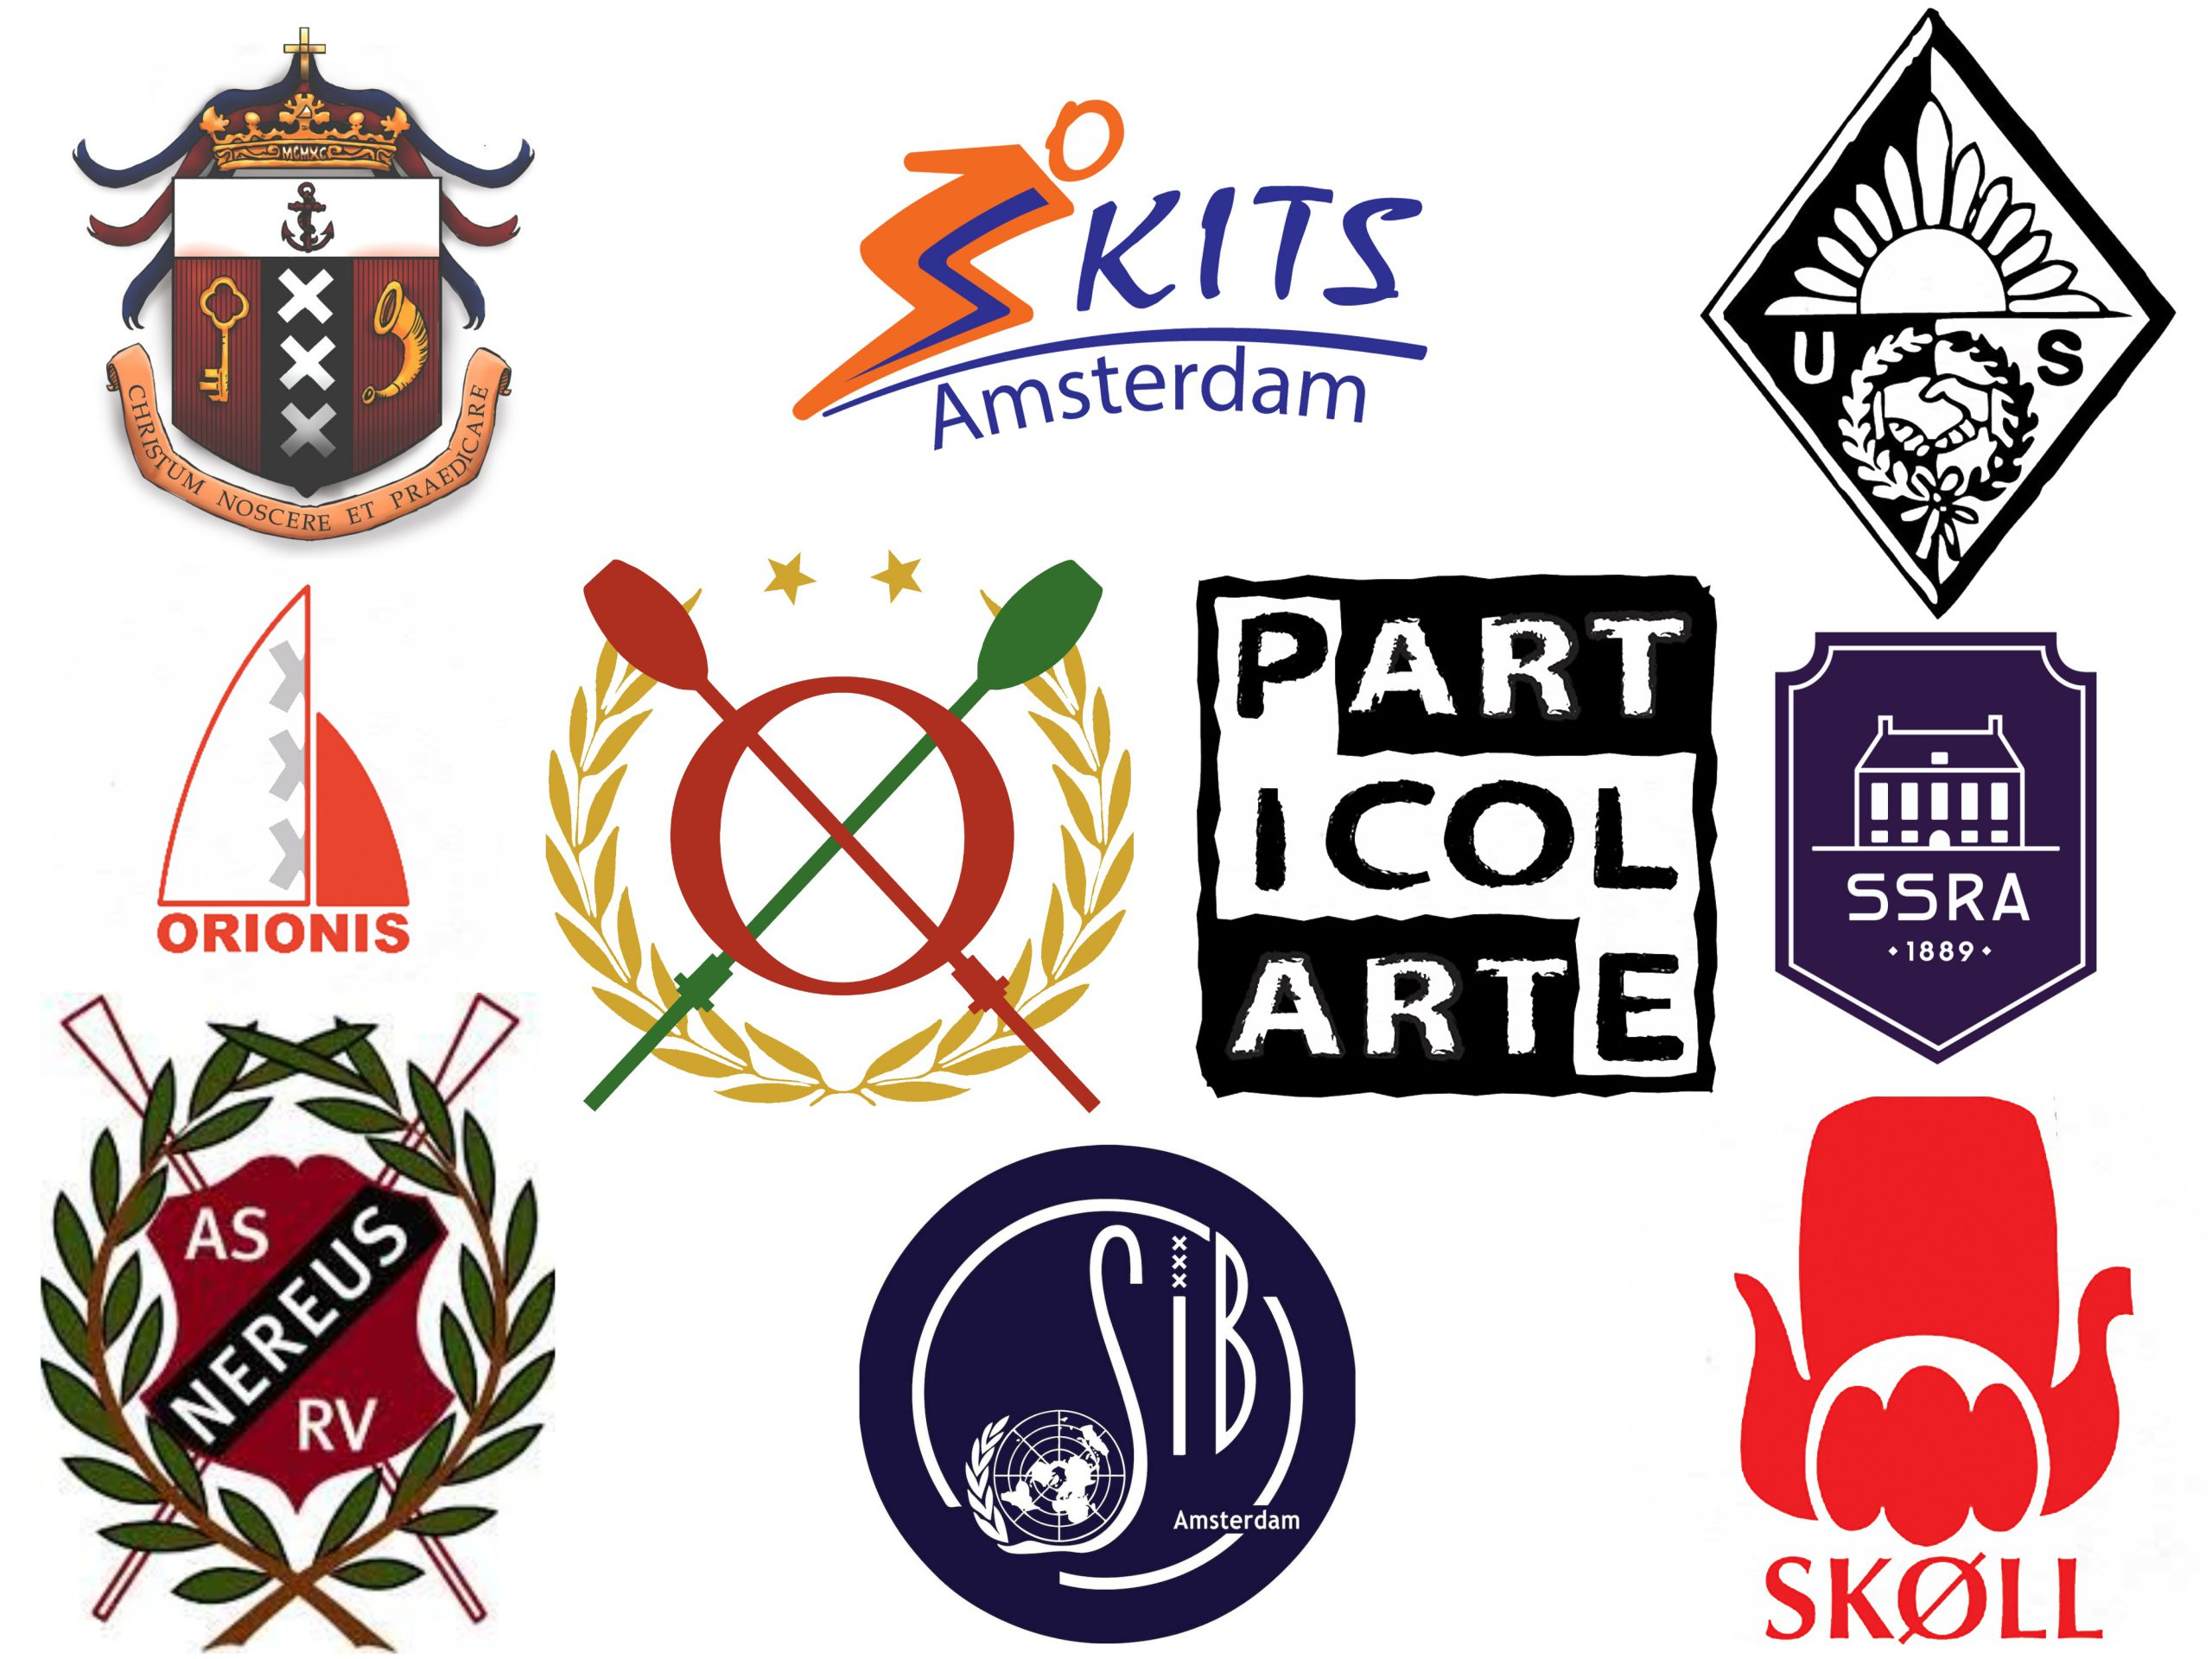 Collage lidverenigingen LKvV